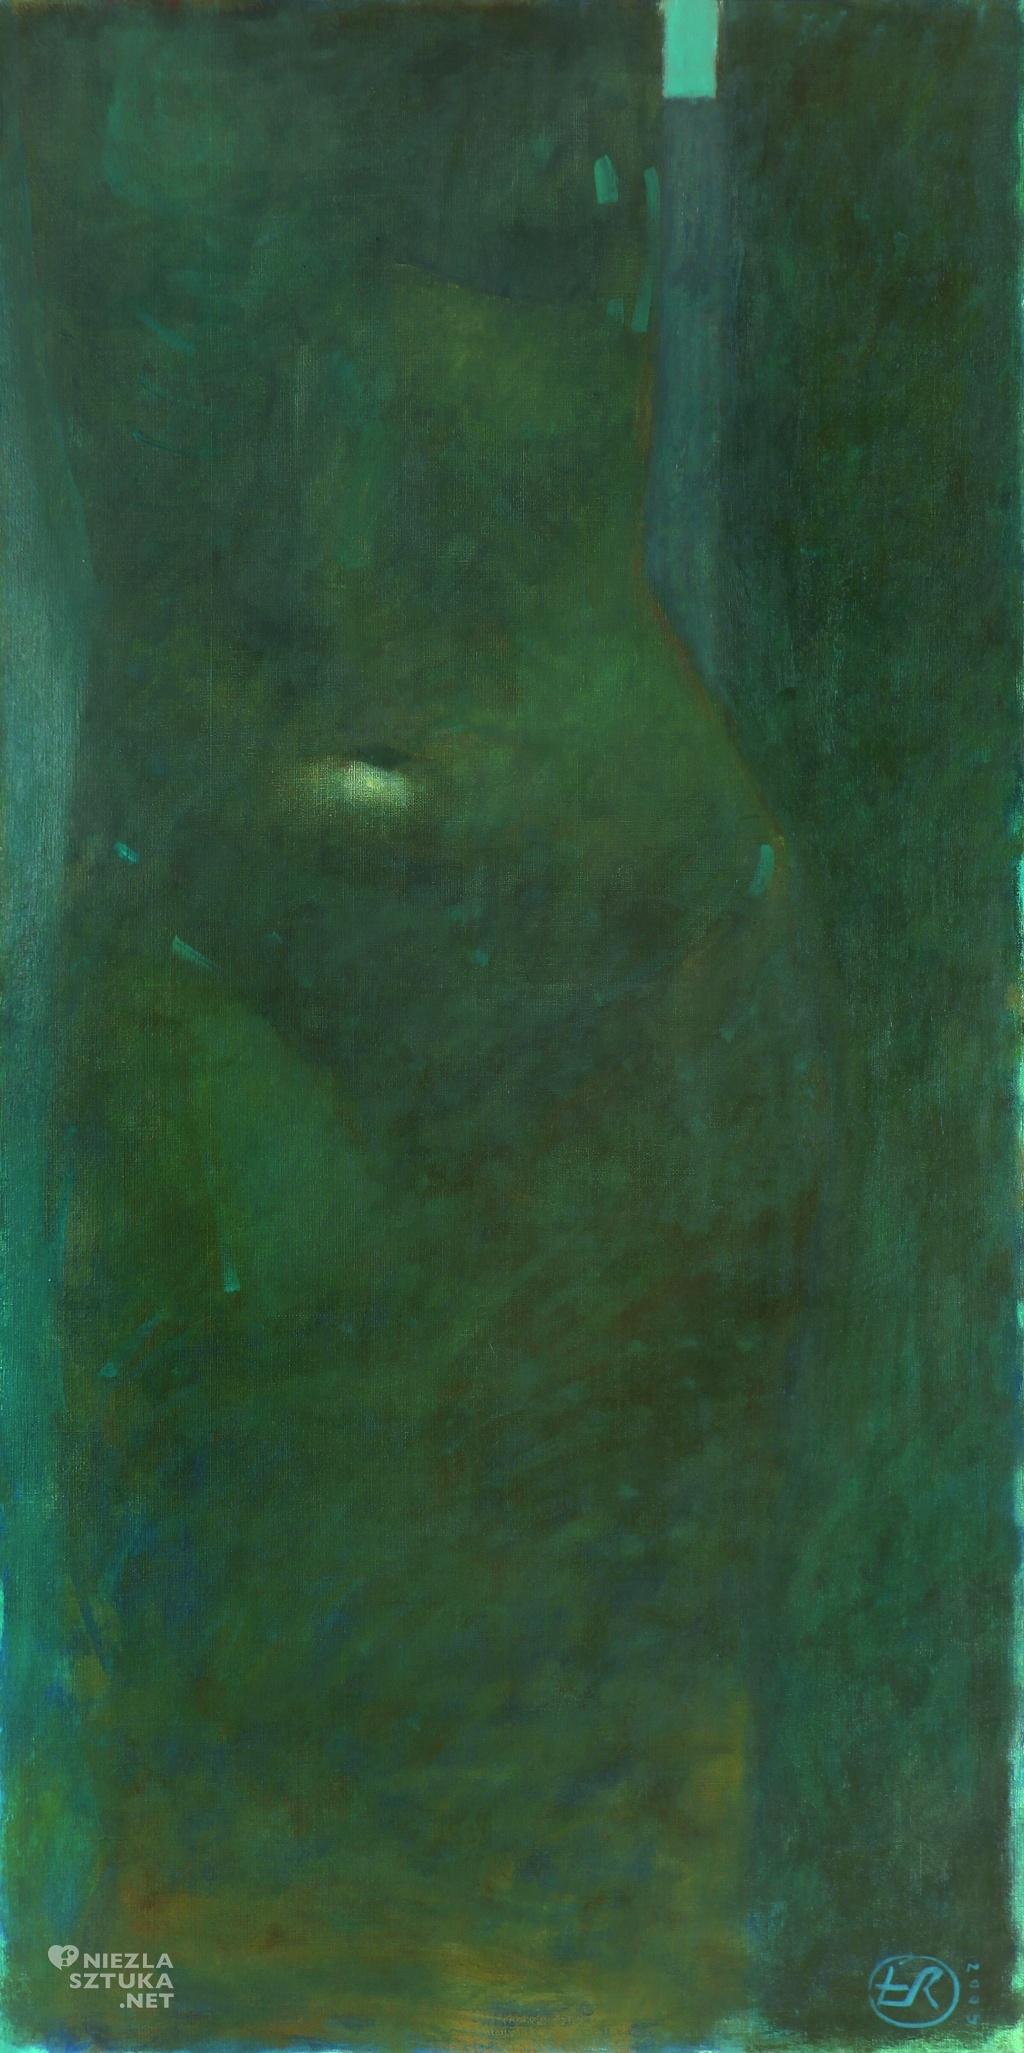 n-figura niebiesko-czarna | 2009